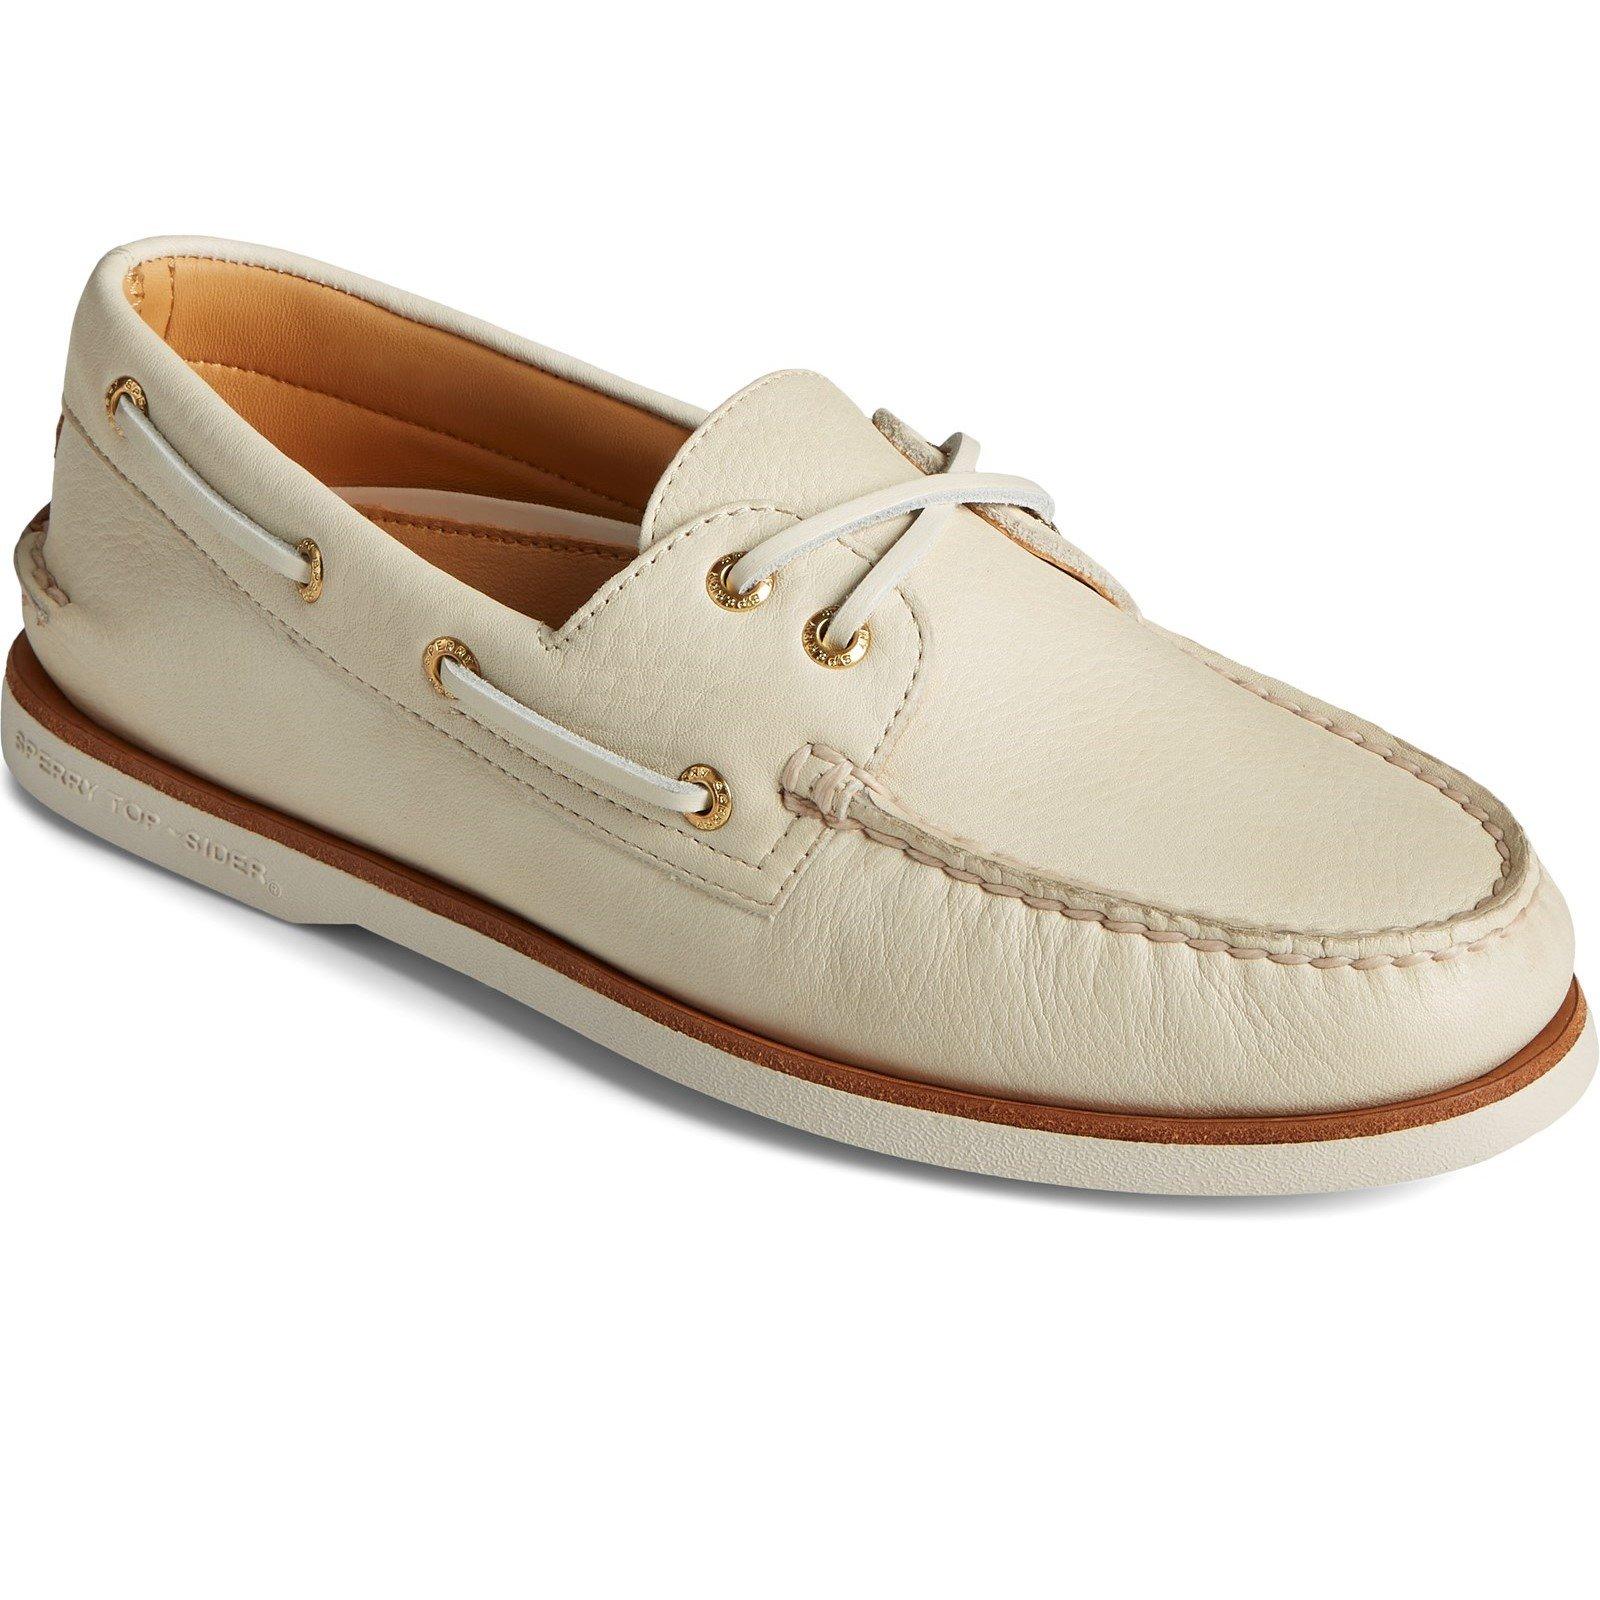 Sperry Men's A/O 2-Eye Boat Shoe Various Colours 32926 - Cream 11